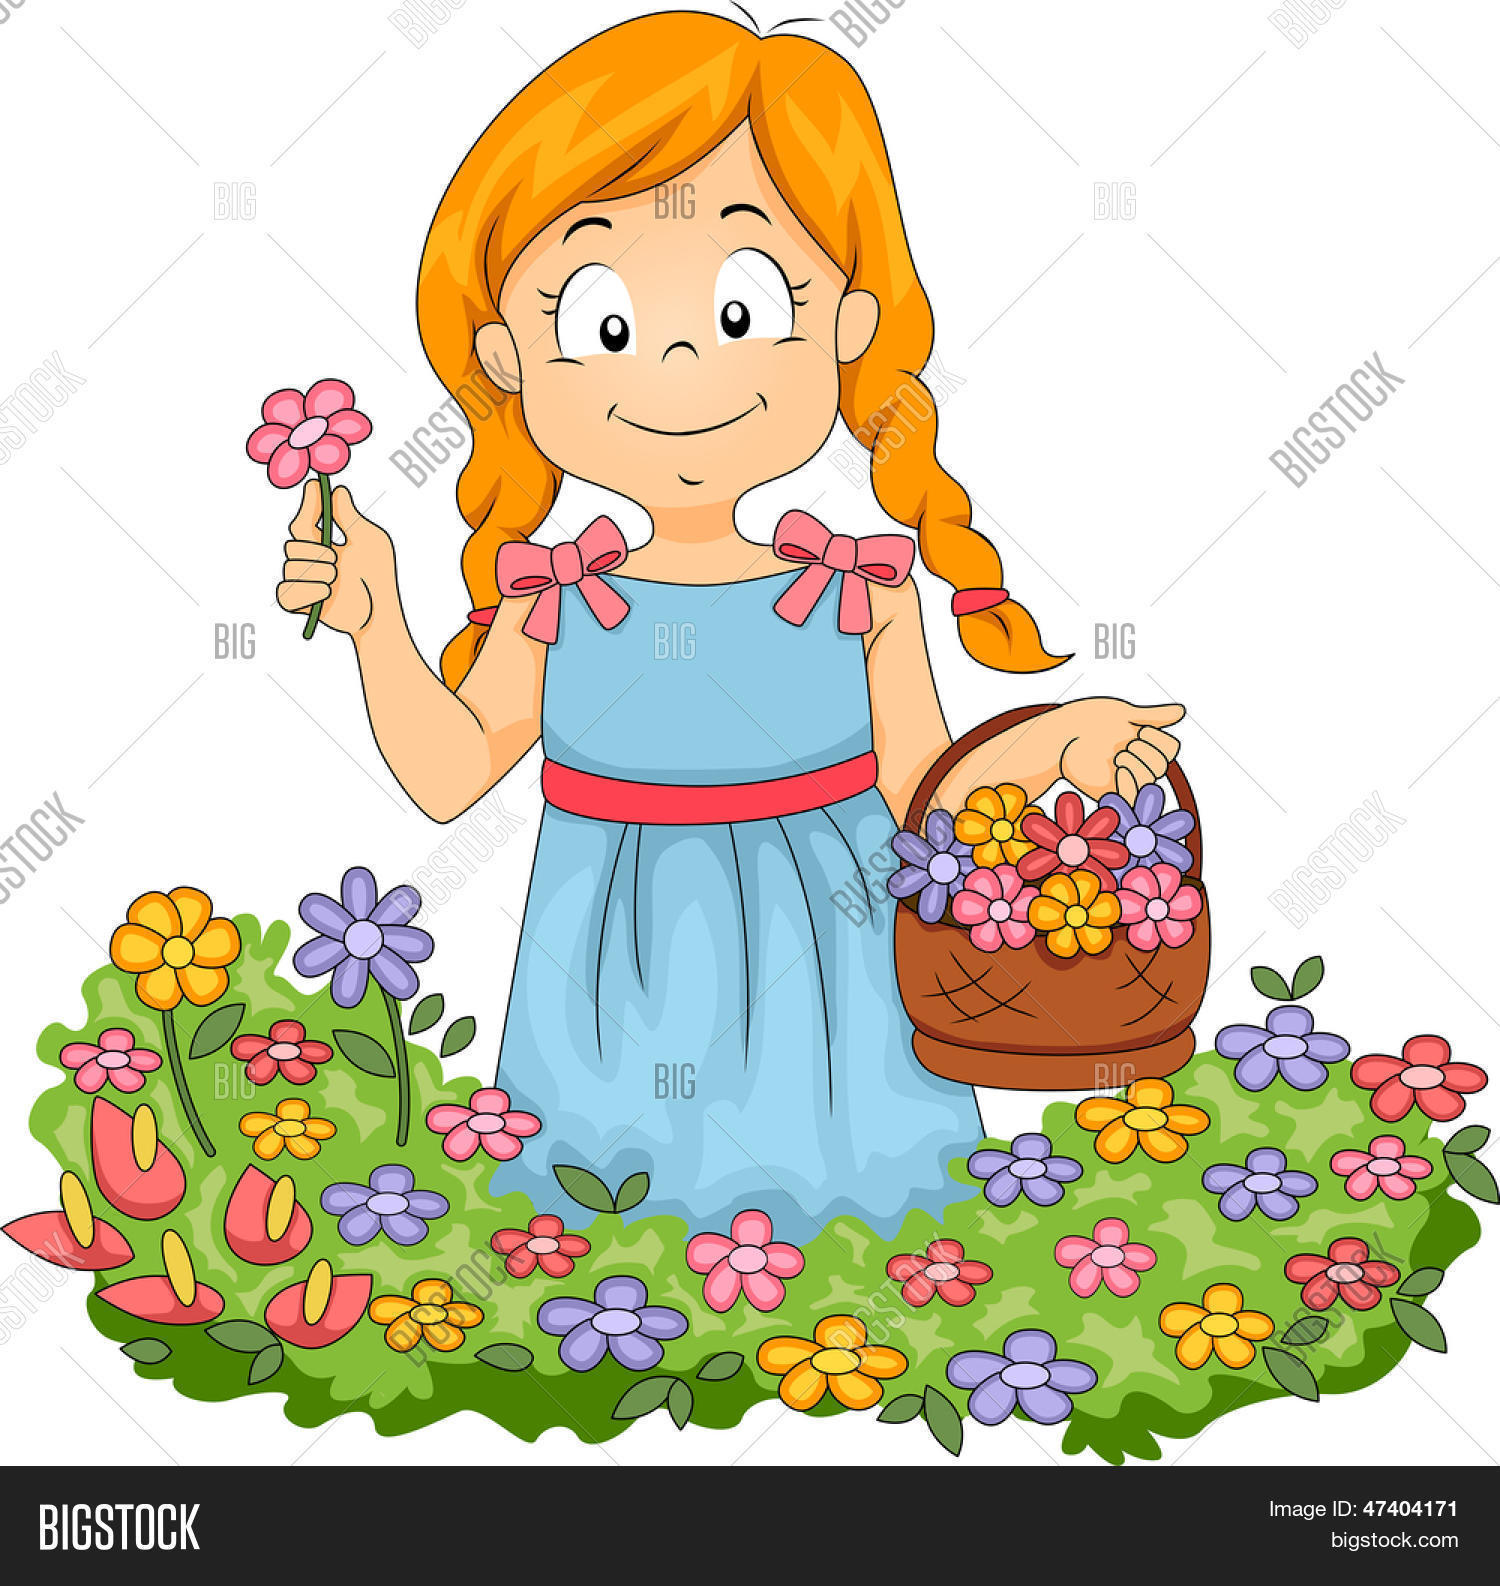 banco de jardim vetor: de flores, colhendo flores em um jardim Bancos de Vetores & Bancos de